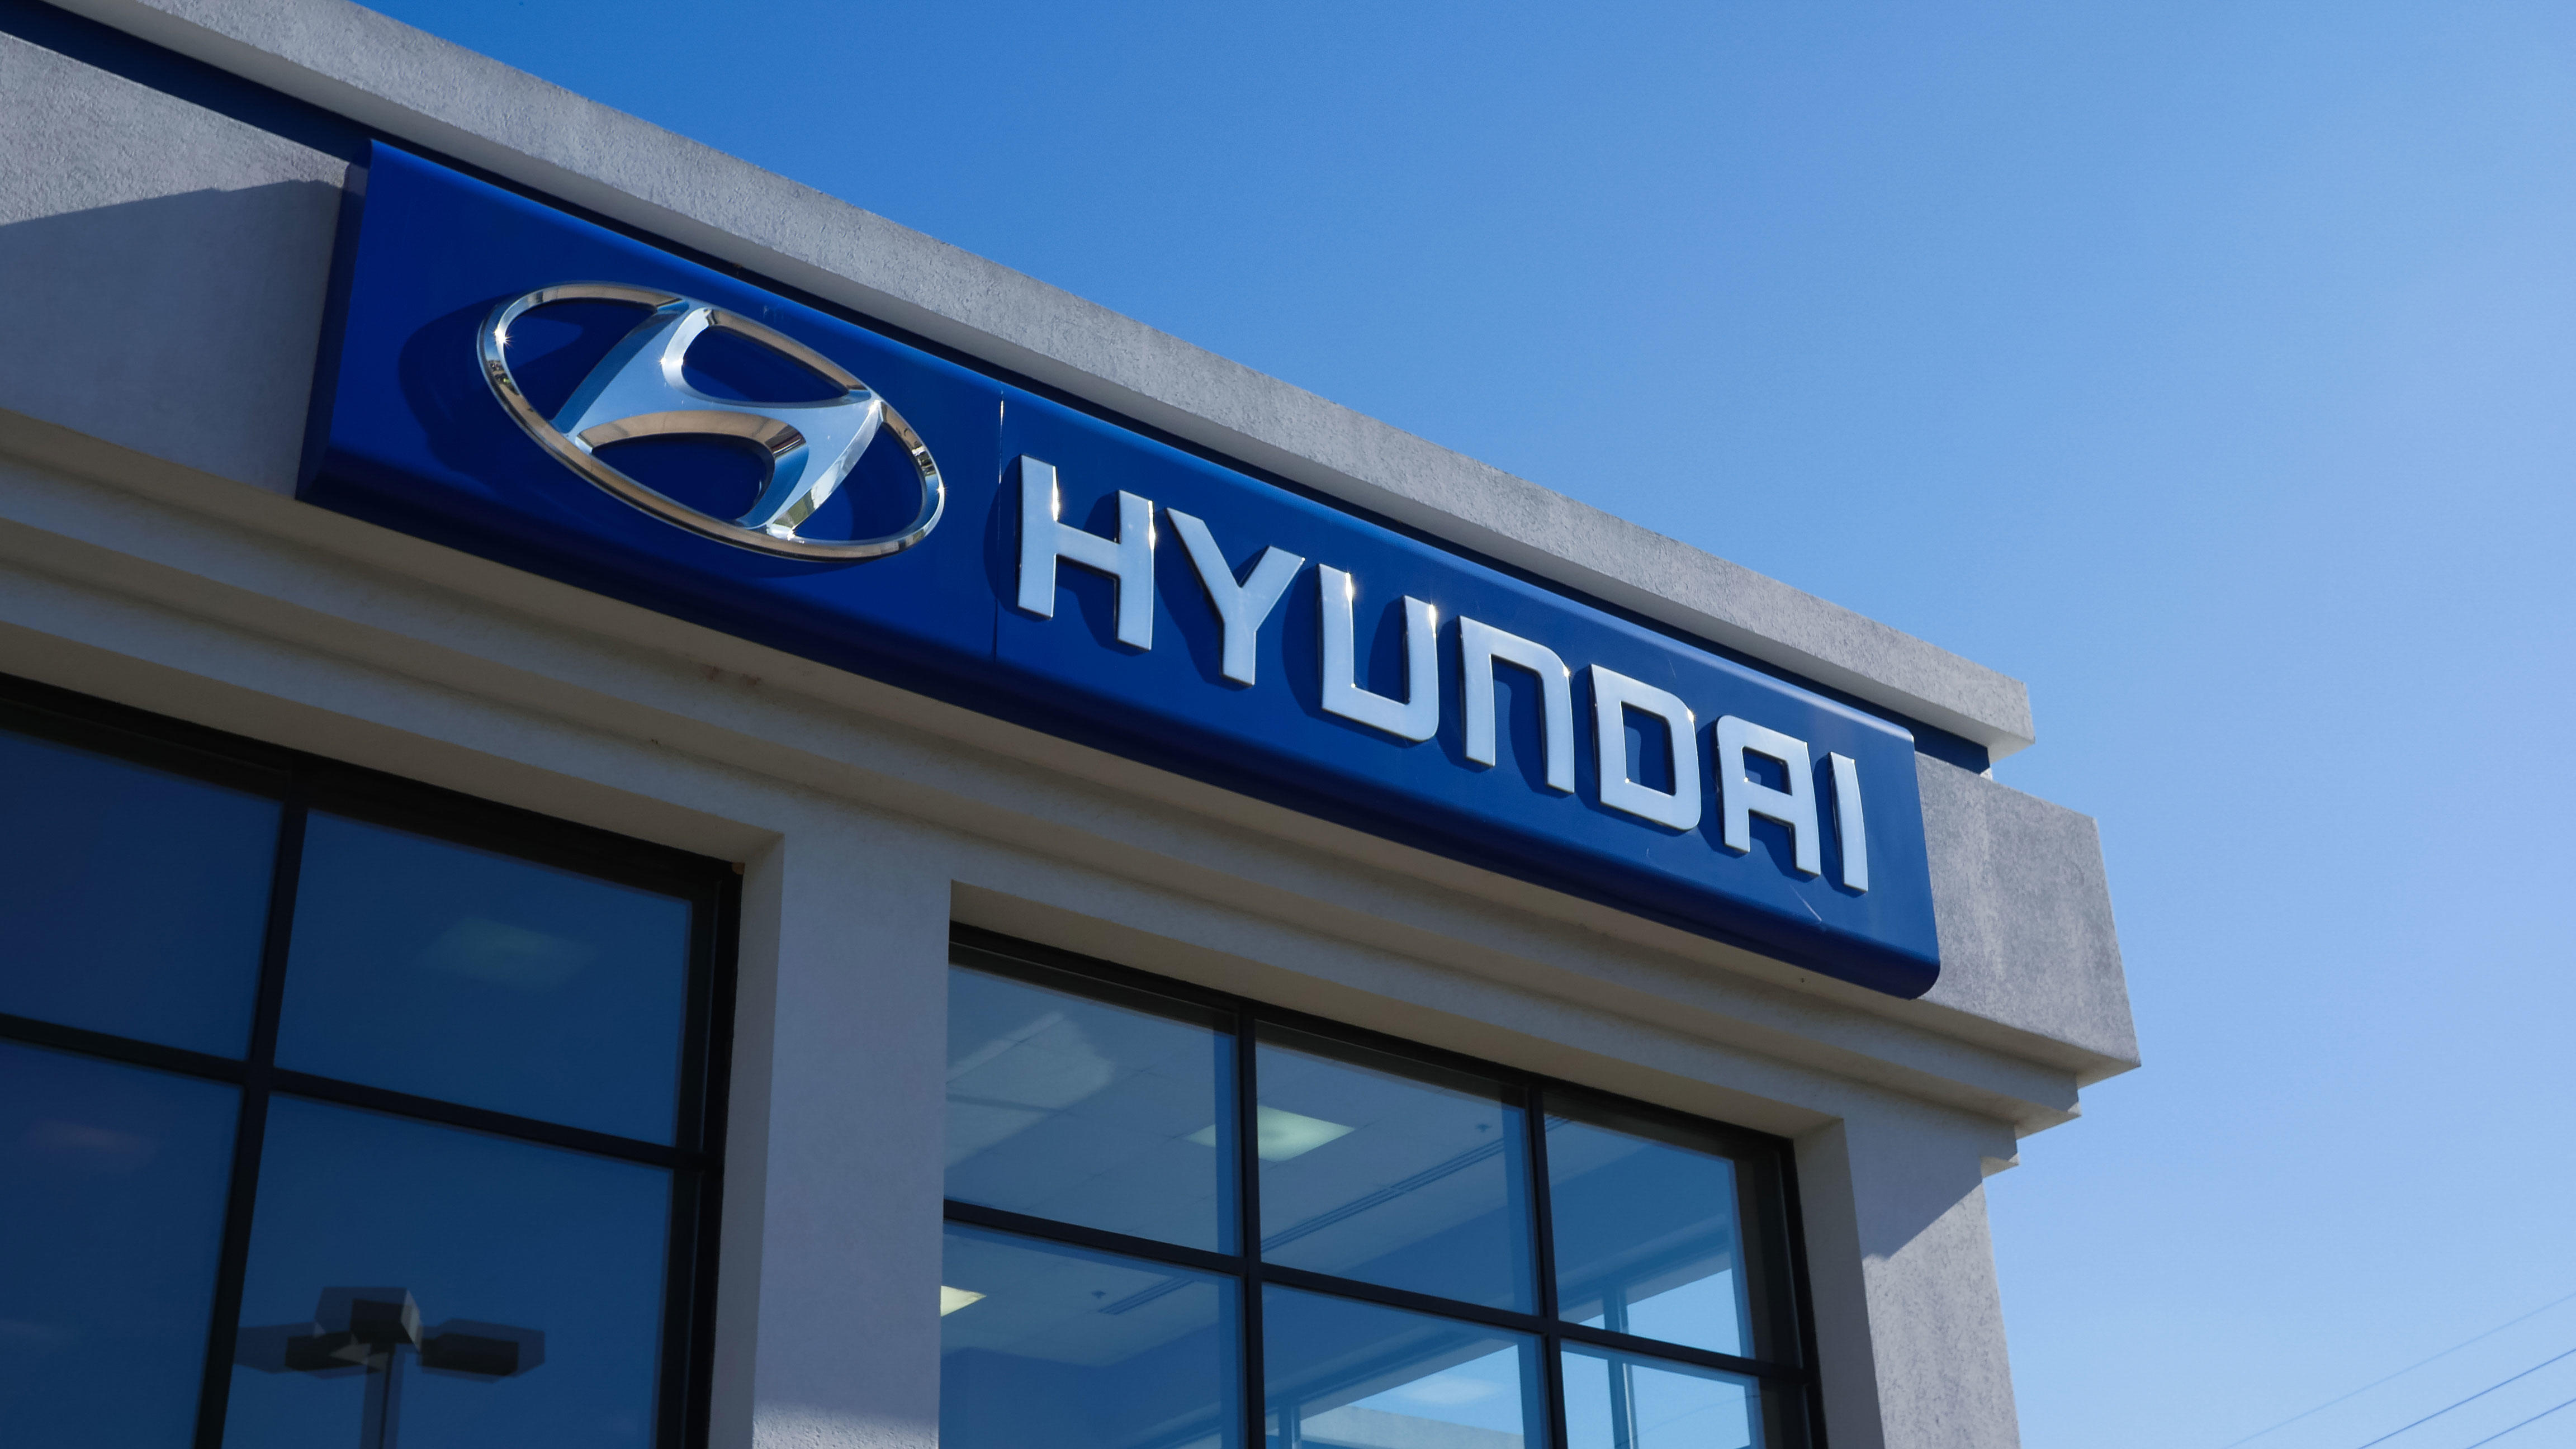 Bachman Hyundai image 7